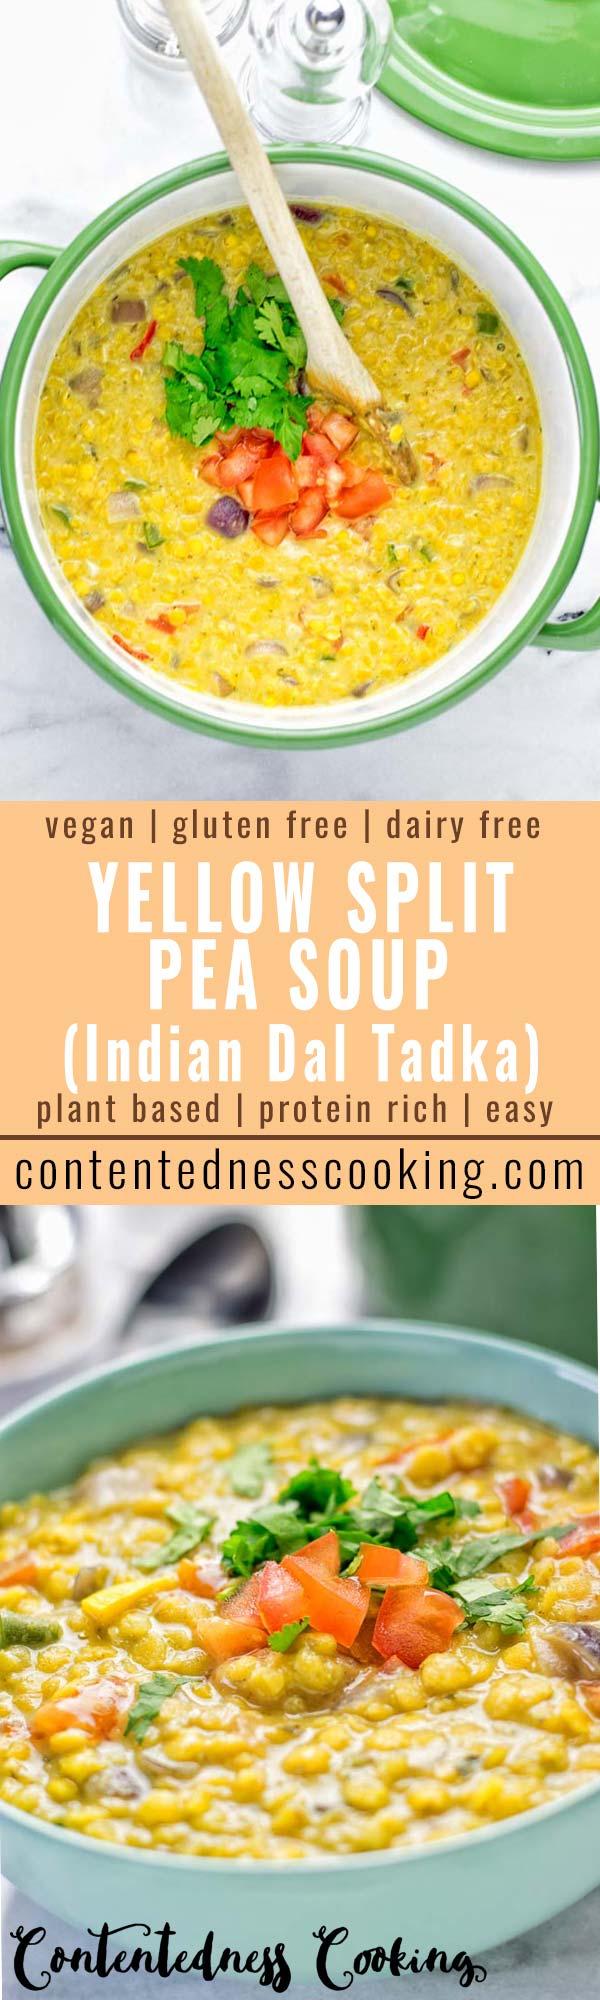 Indian Yellow Split Pea Soup (Dal Tadka)   #vegan #glutenfree #contentednesscooking #soup